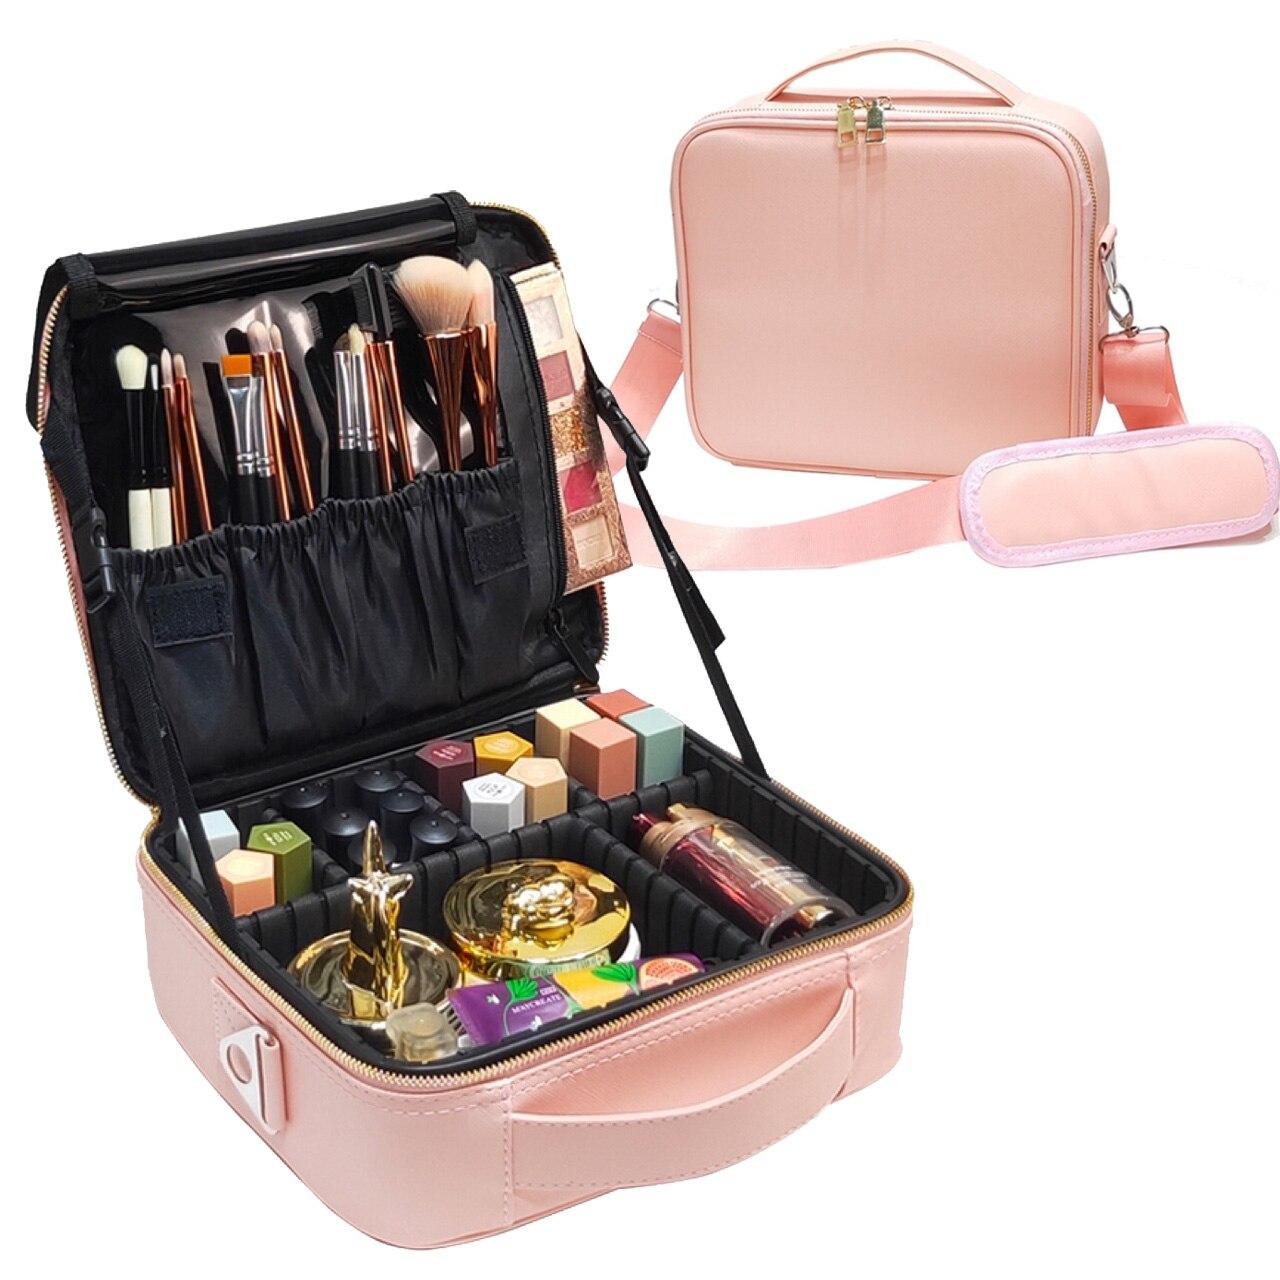 New Women Makeup Large Capacity Cosmetic Bag Beauty Salon Tattoos Nail Art Tool Bin Case|Cosmetic Bags & Cases| - AliExpress